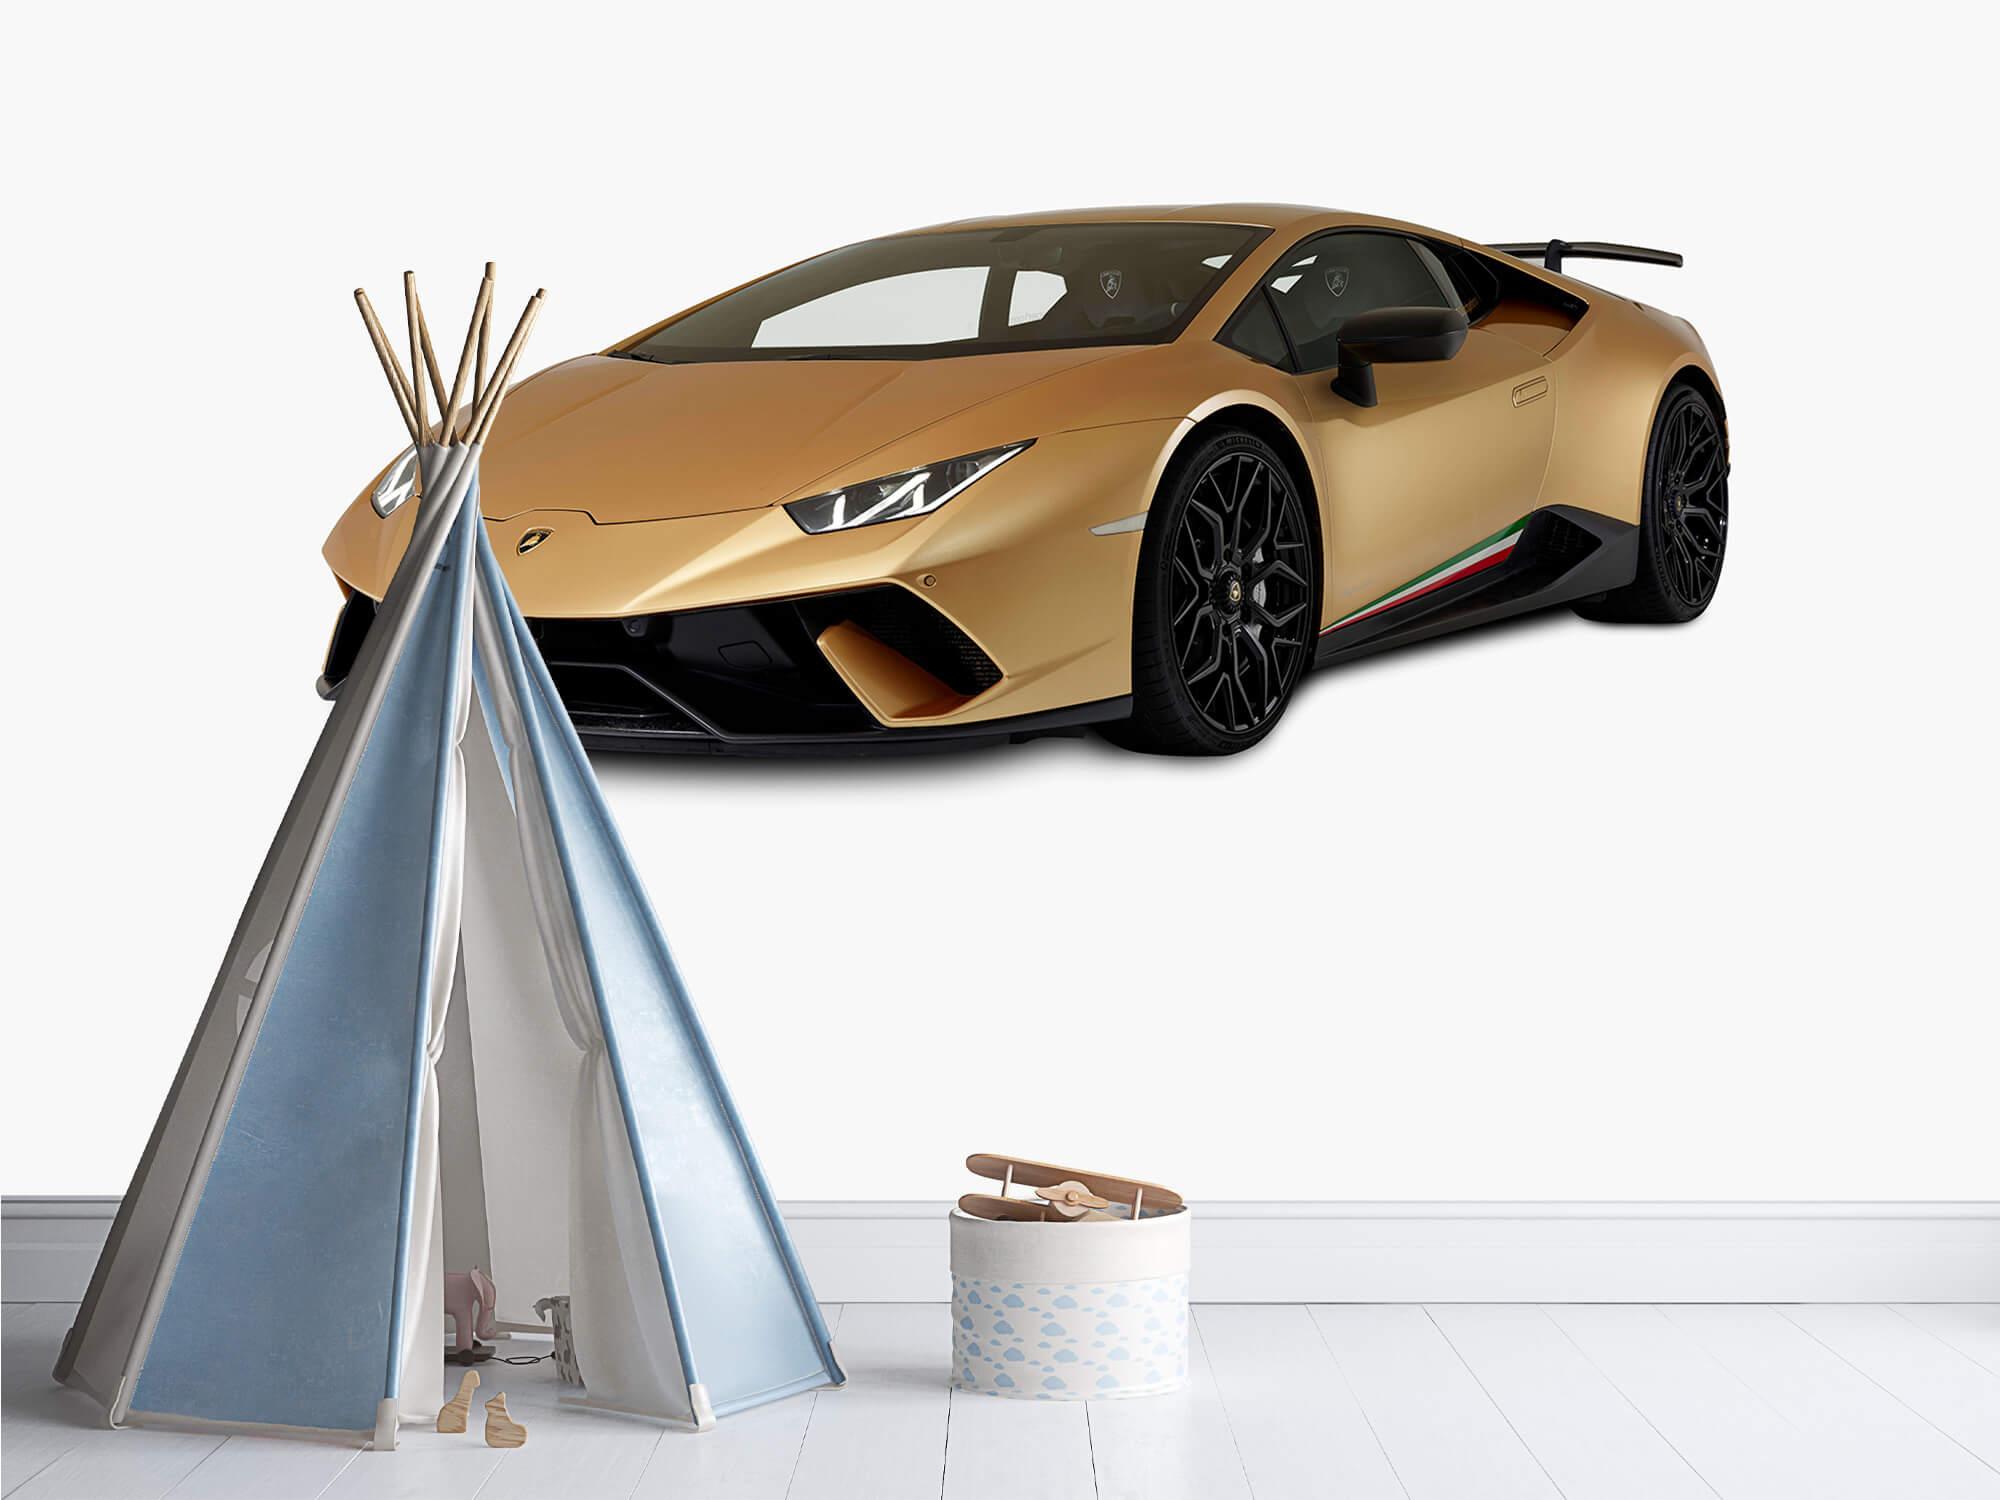 Wallpaper Lamborghini Huracán - Rechter voorkant wit 10